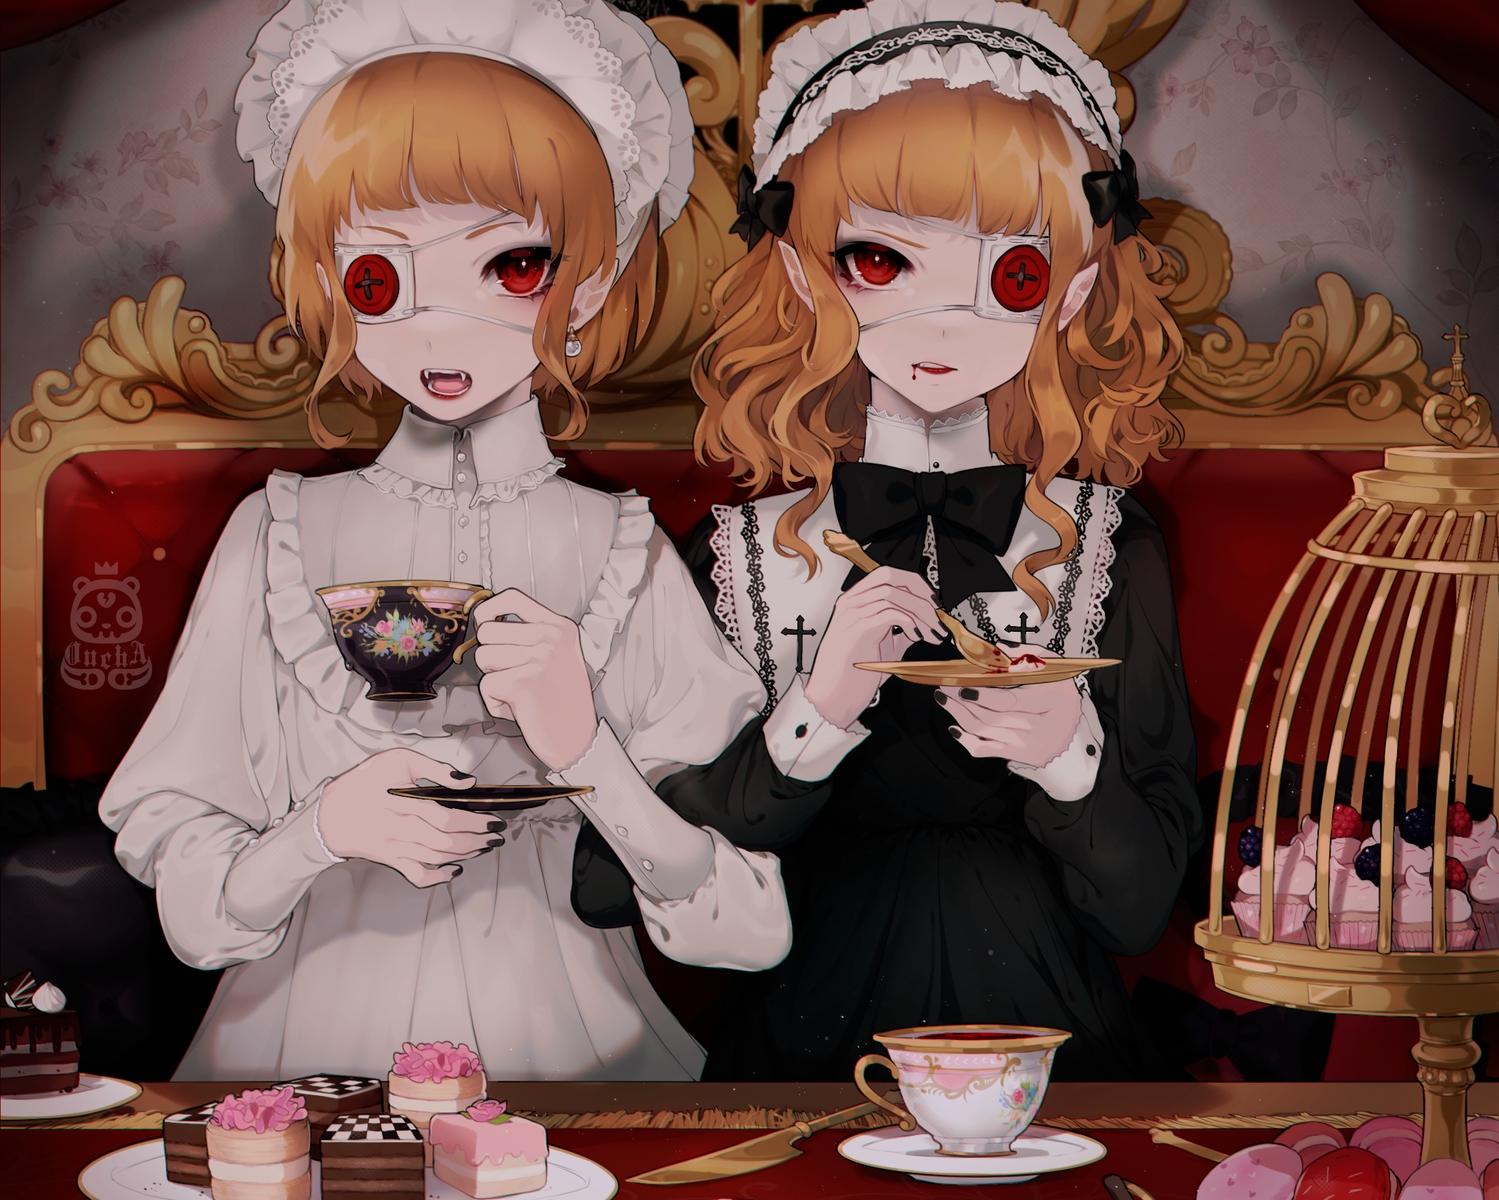 blonde_hair cake cropped drink eyepatch food goth-loli headdress lolita_fashion male oncha original pointed_ears red_eyes short_hair trap vampire watermark